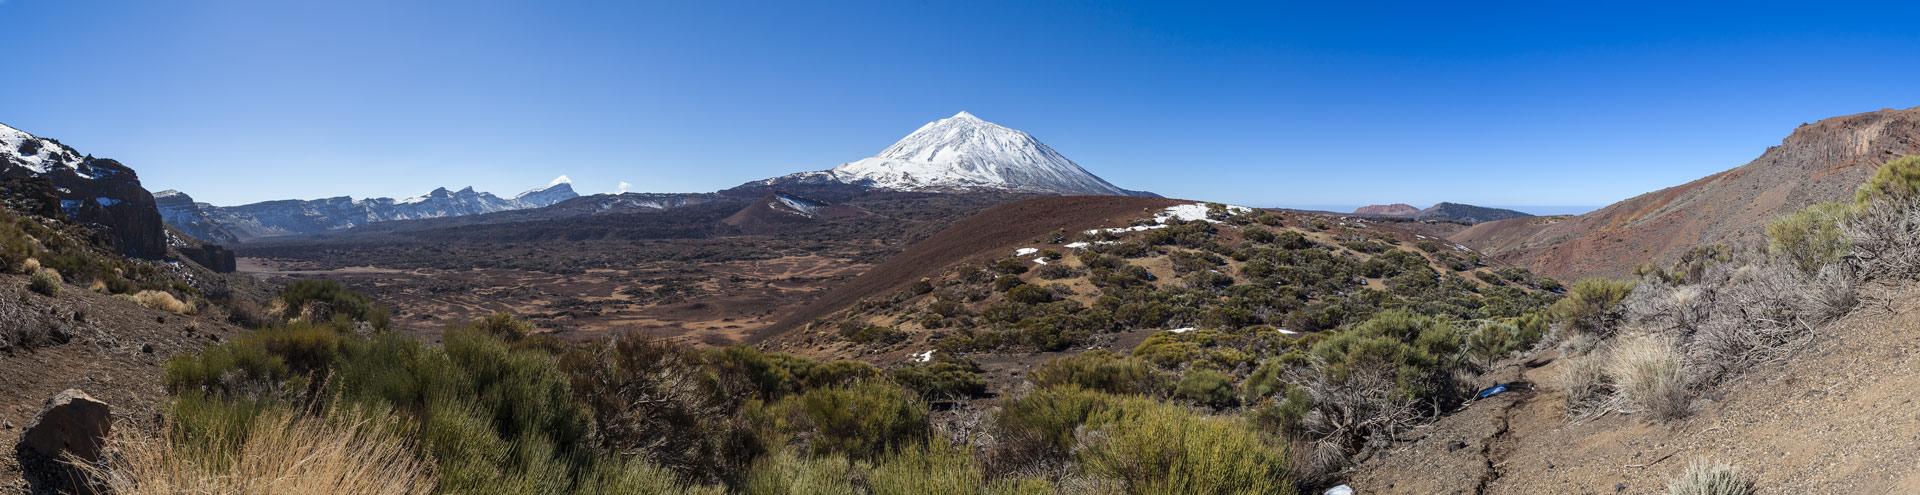 The caldera of the Teide volcano on Ternerife island